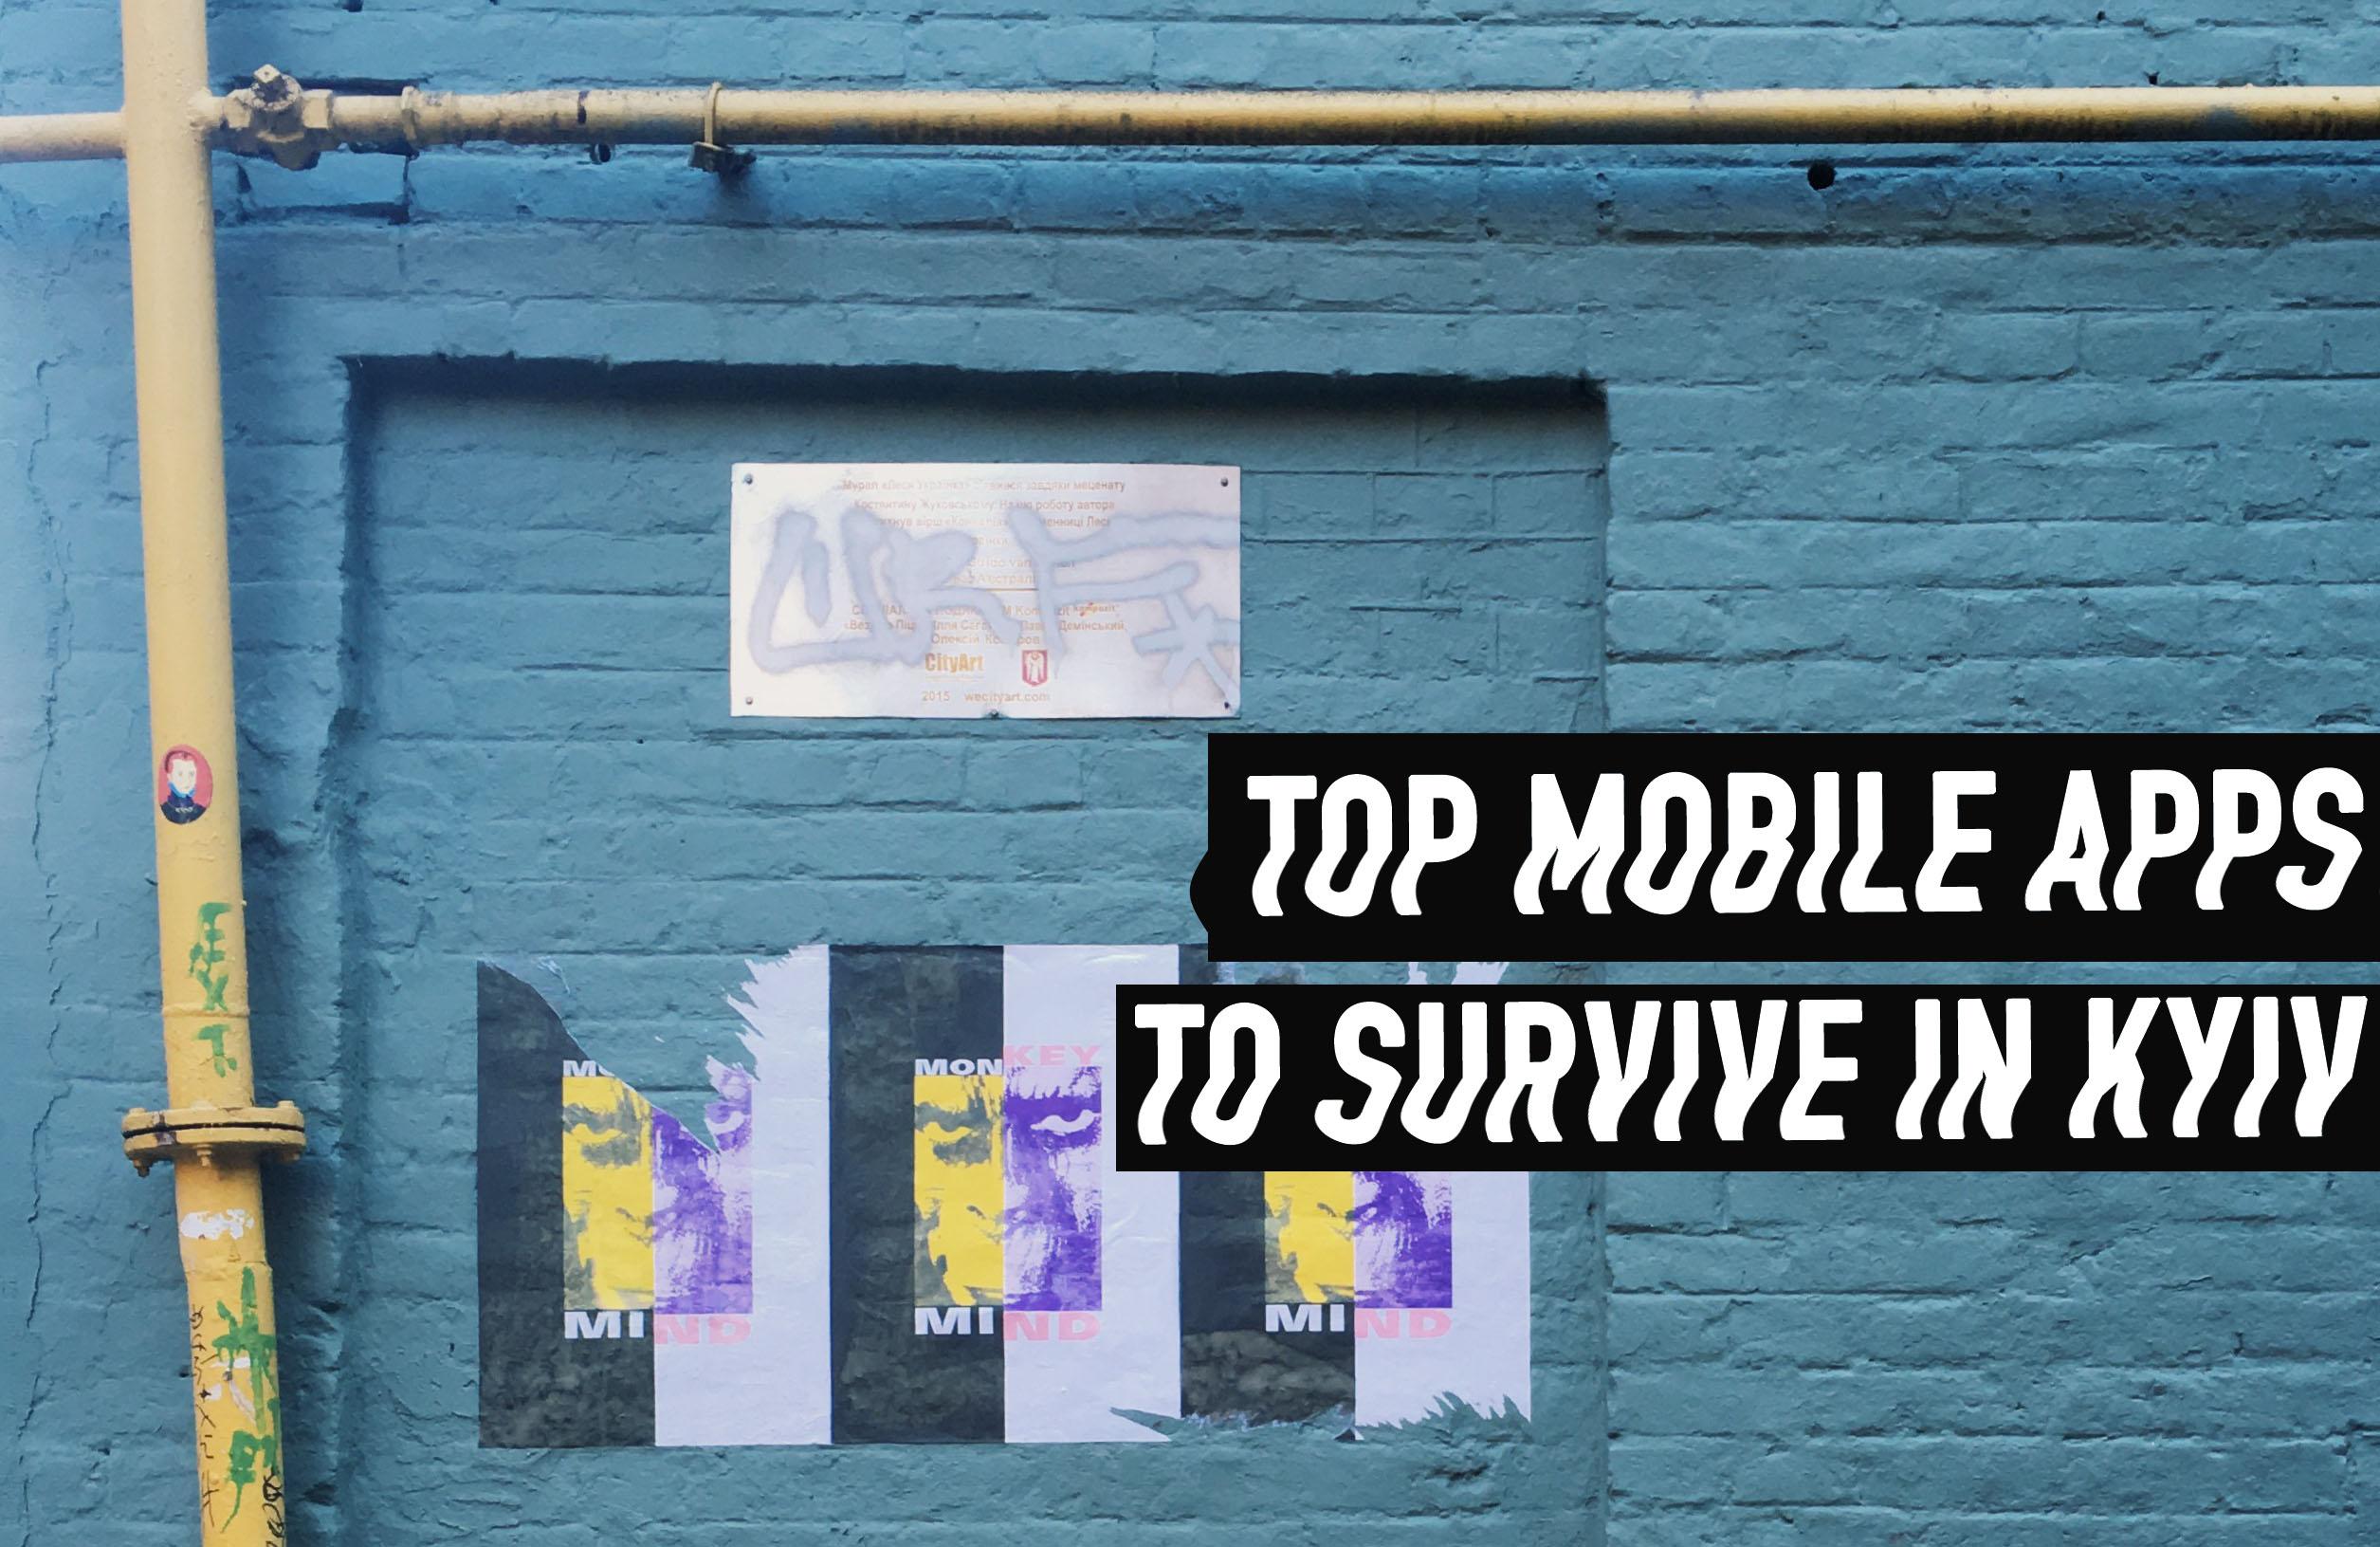 Mobile apps Kyiv